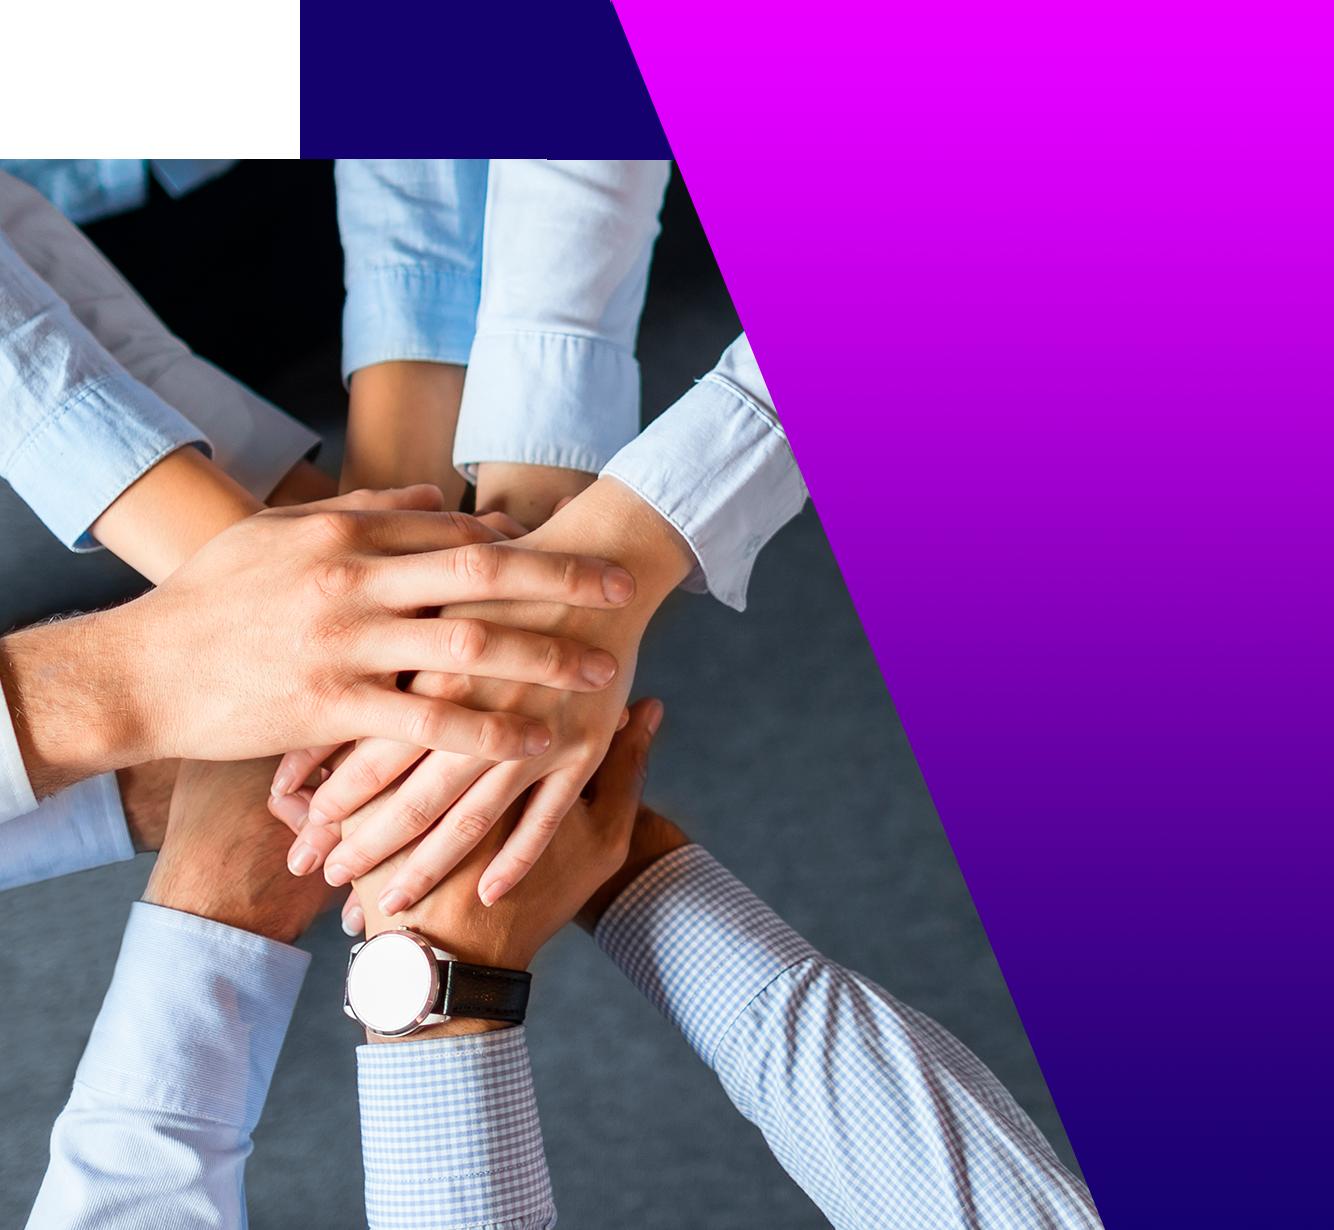 https://azerouno.it/wp-content/uploads/2021/06/azerouno-supportCenter-Consulenza-CustomerCare.png